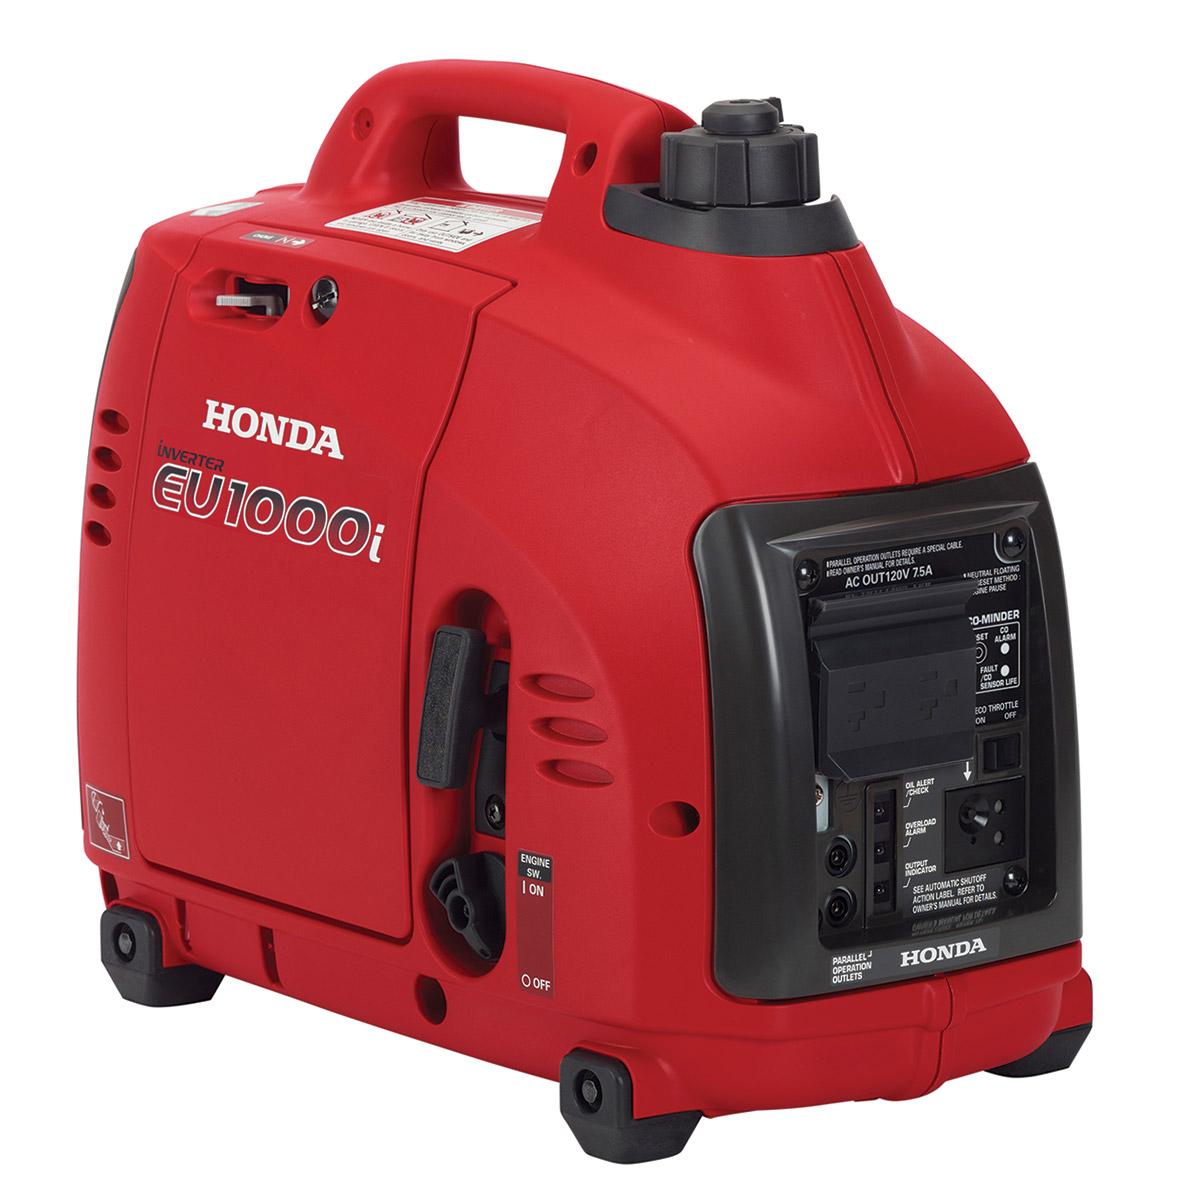 Honda EU1000i Generator (1000W)